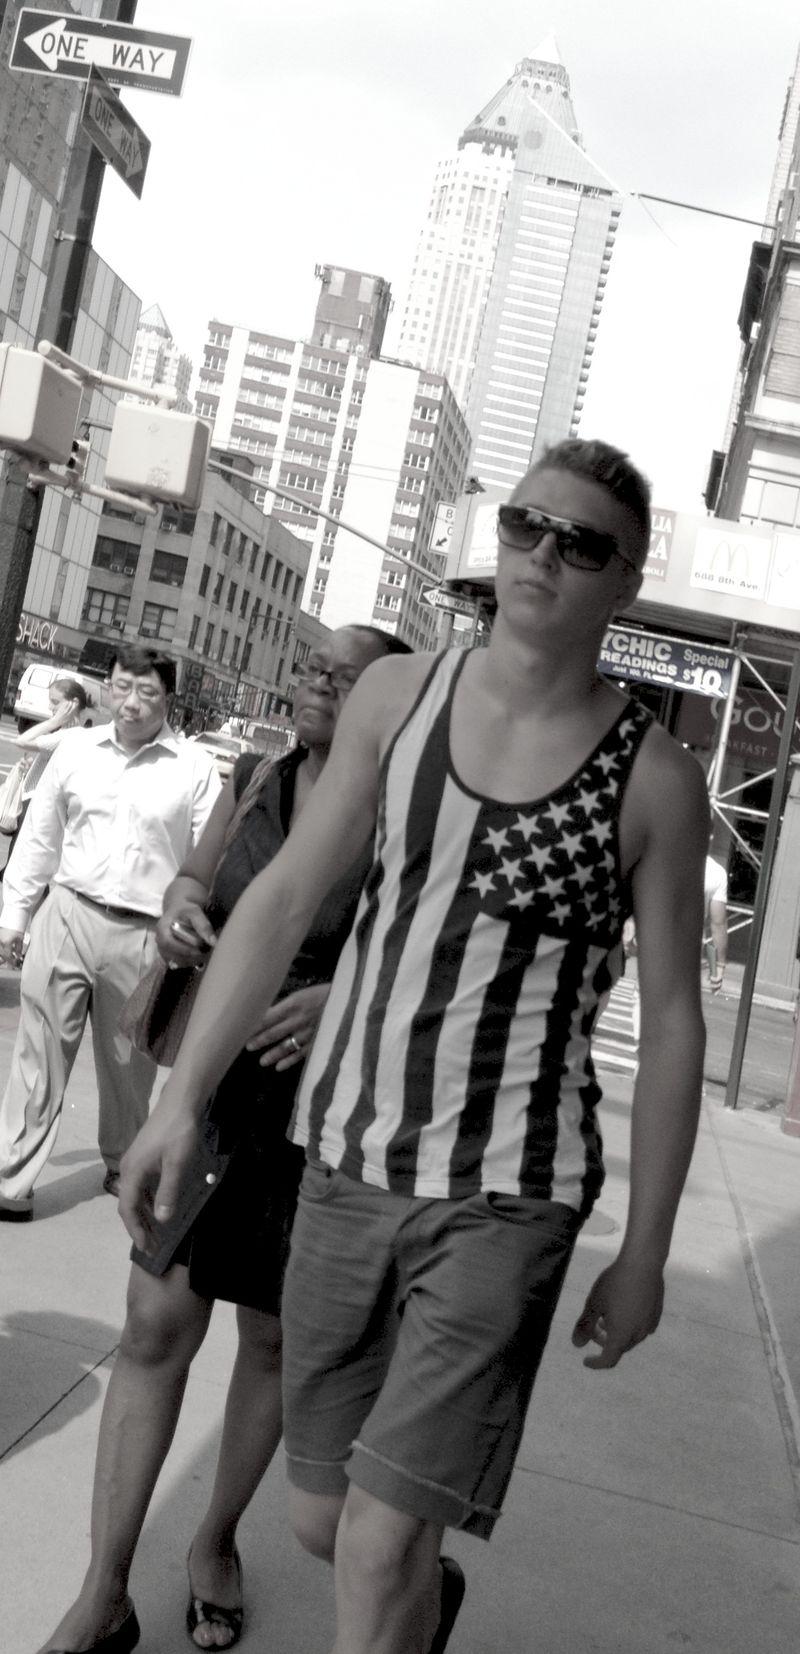 Sexy patriot